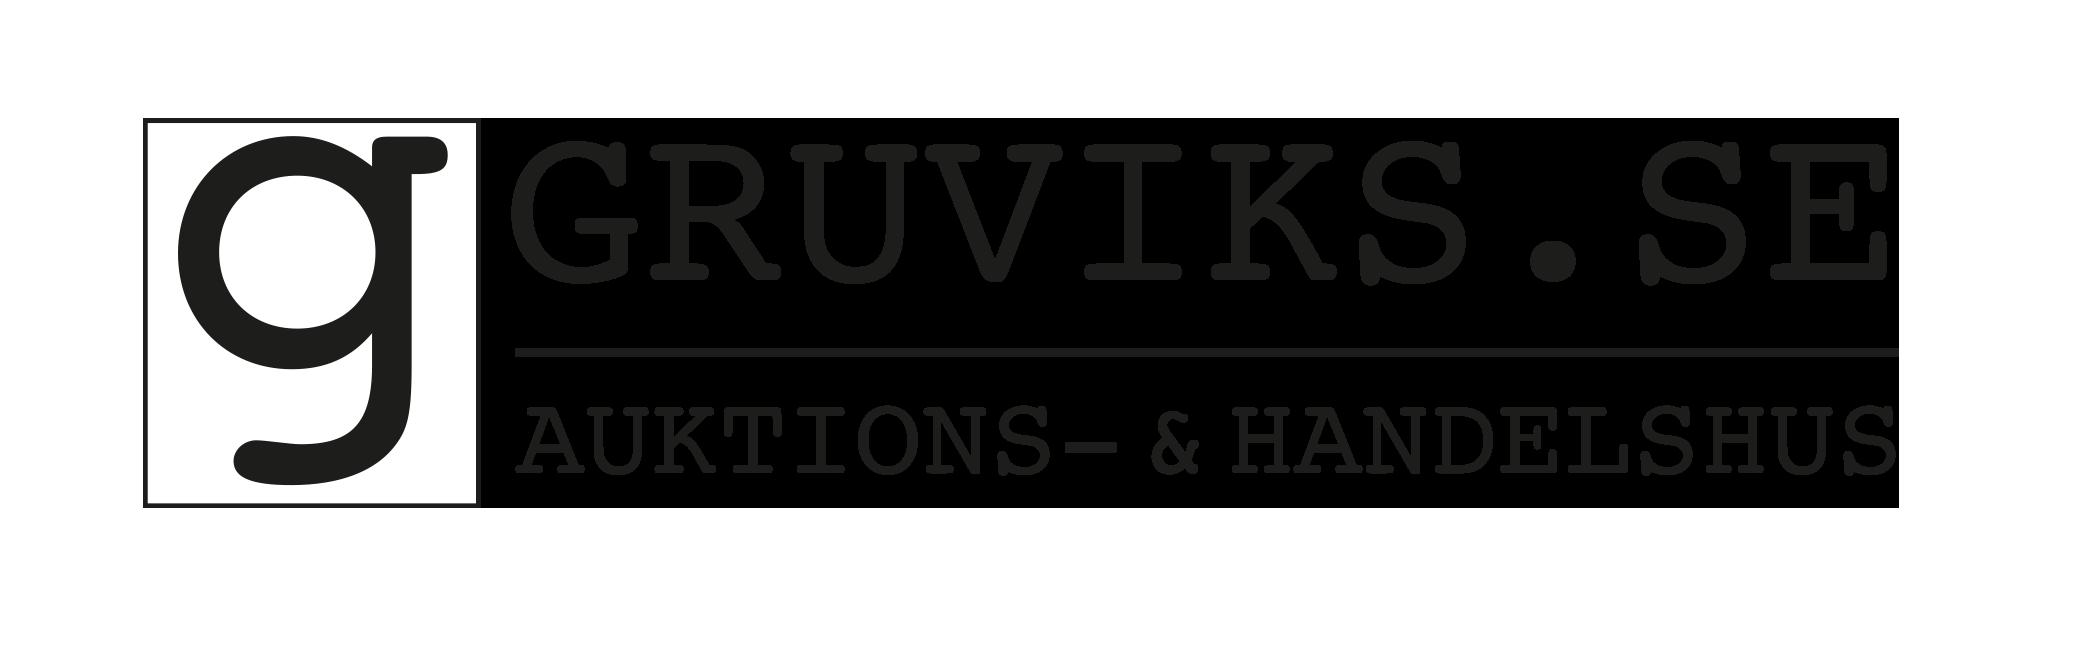 Gruviks Auktions- & Handelshus